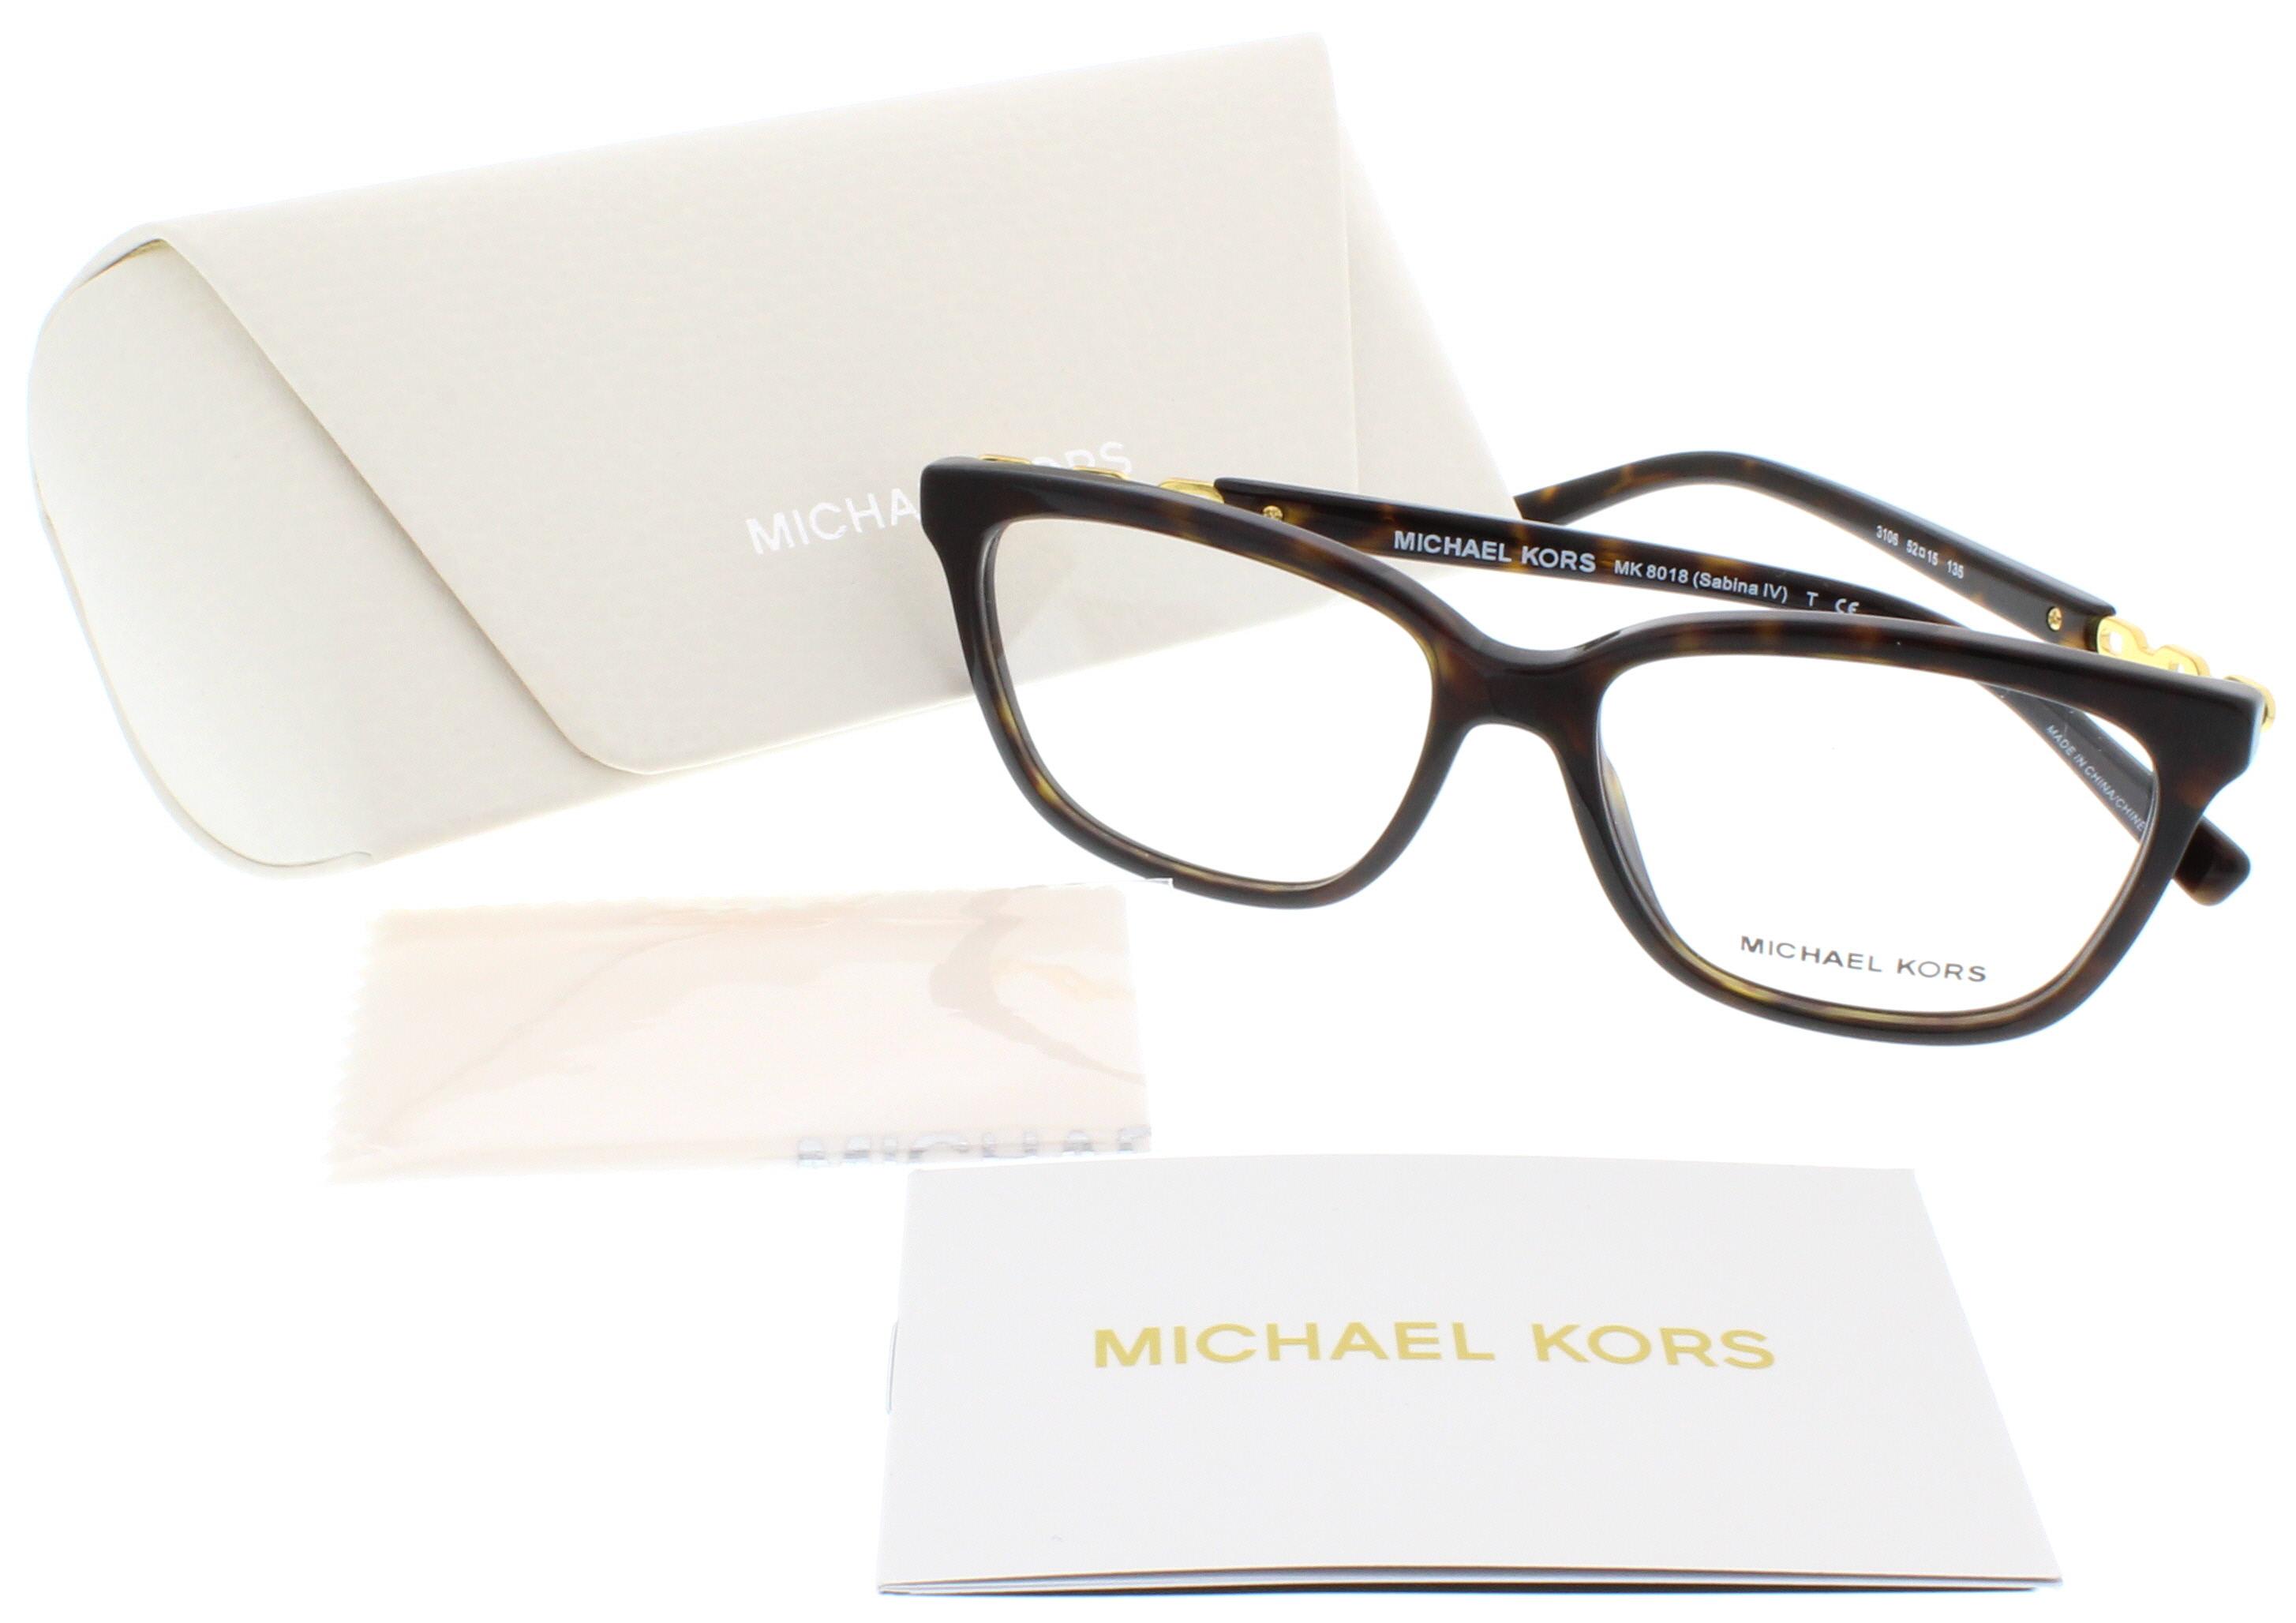 e955484cf1b Designer Frames Outlet. Michael Kors MK8018 Sabina IV